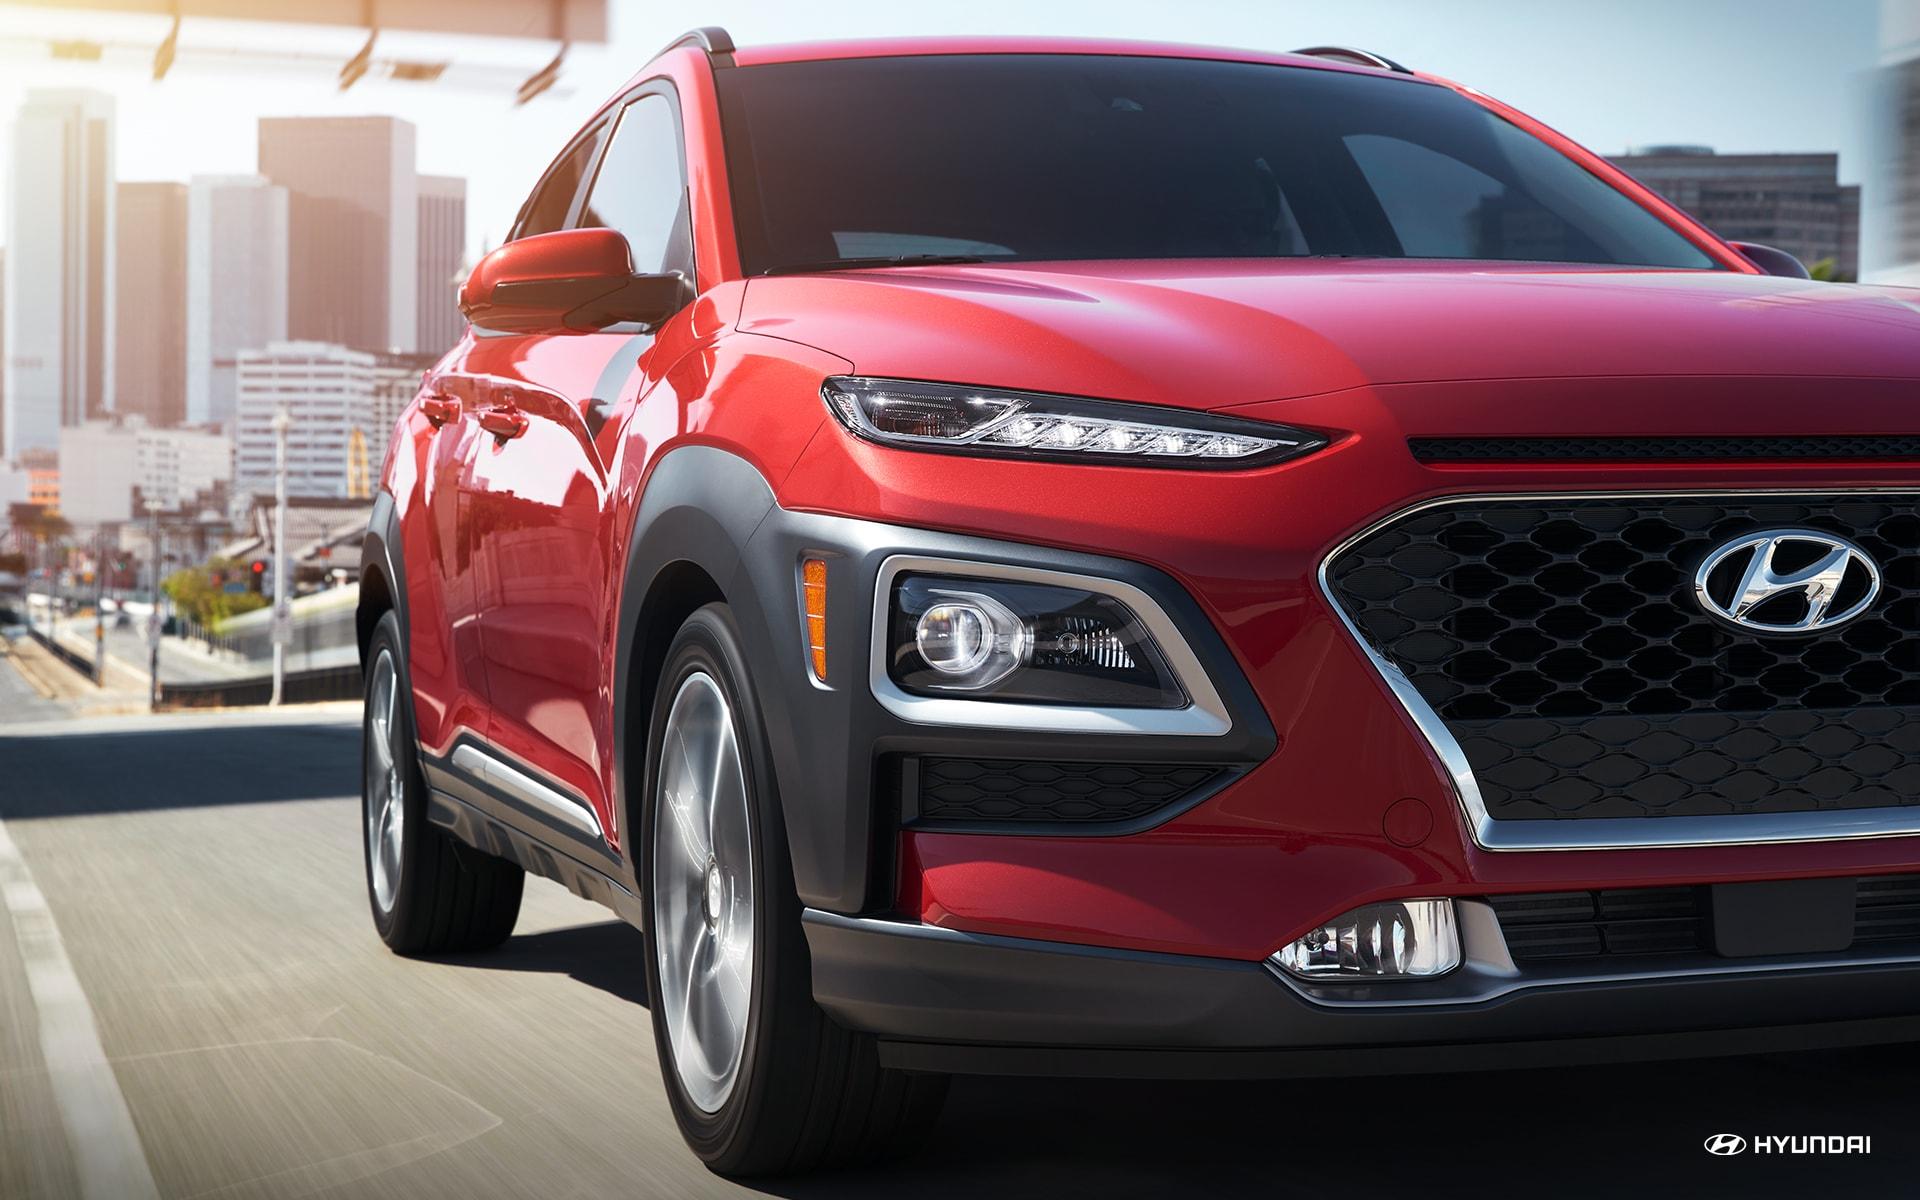 Hyundai Kona 2019 a la venta cerca de Stafford, VA